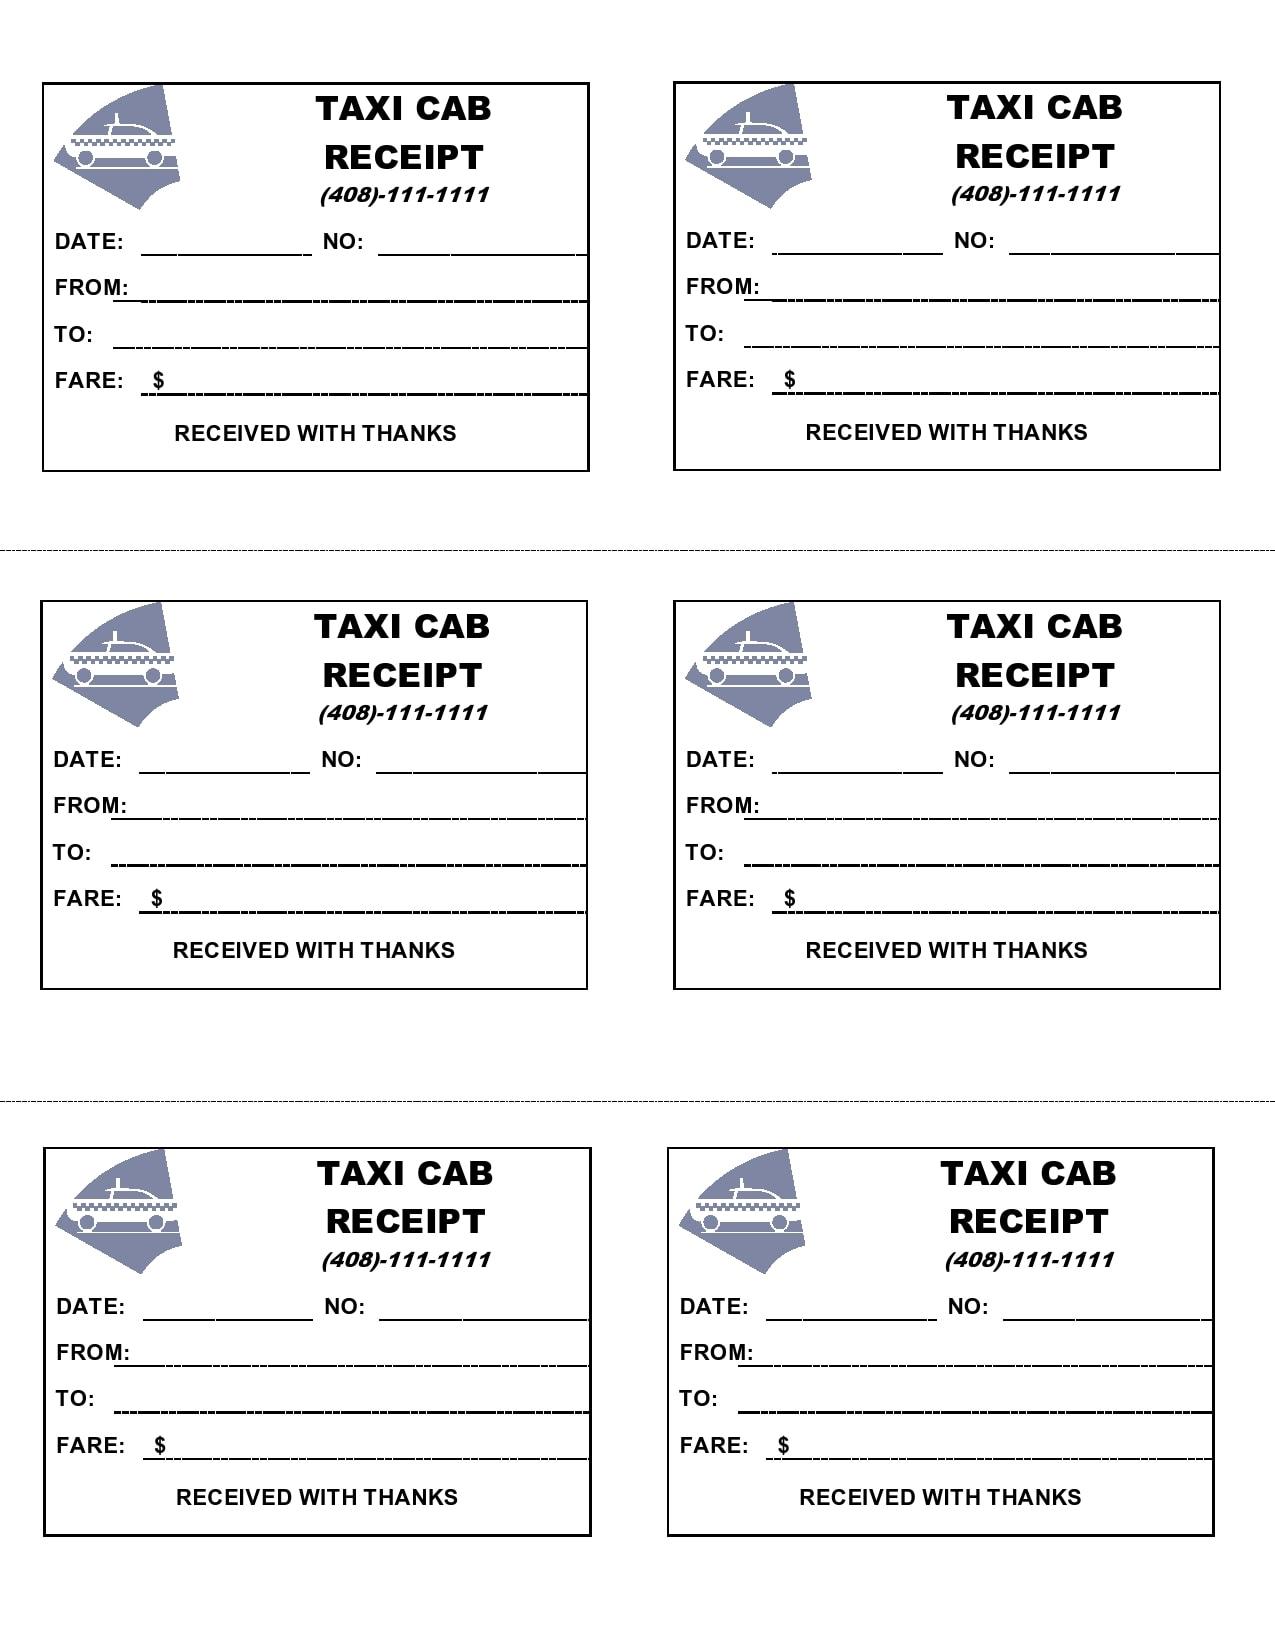 taxi receipt 06